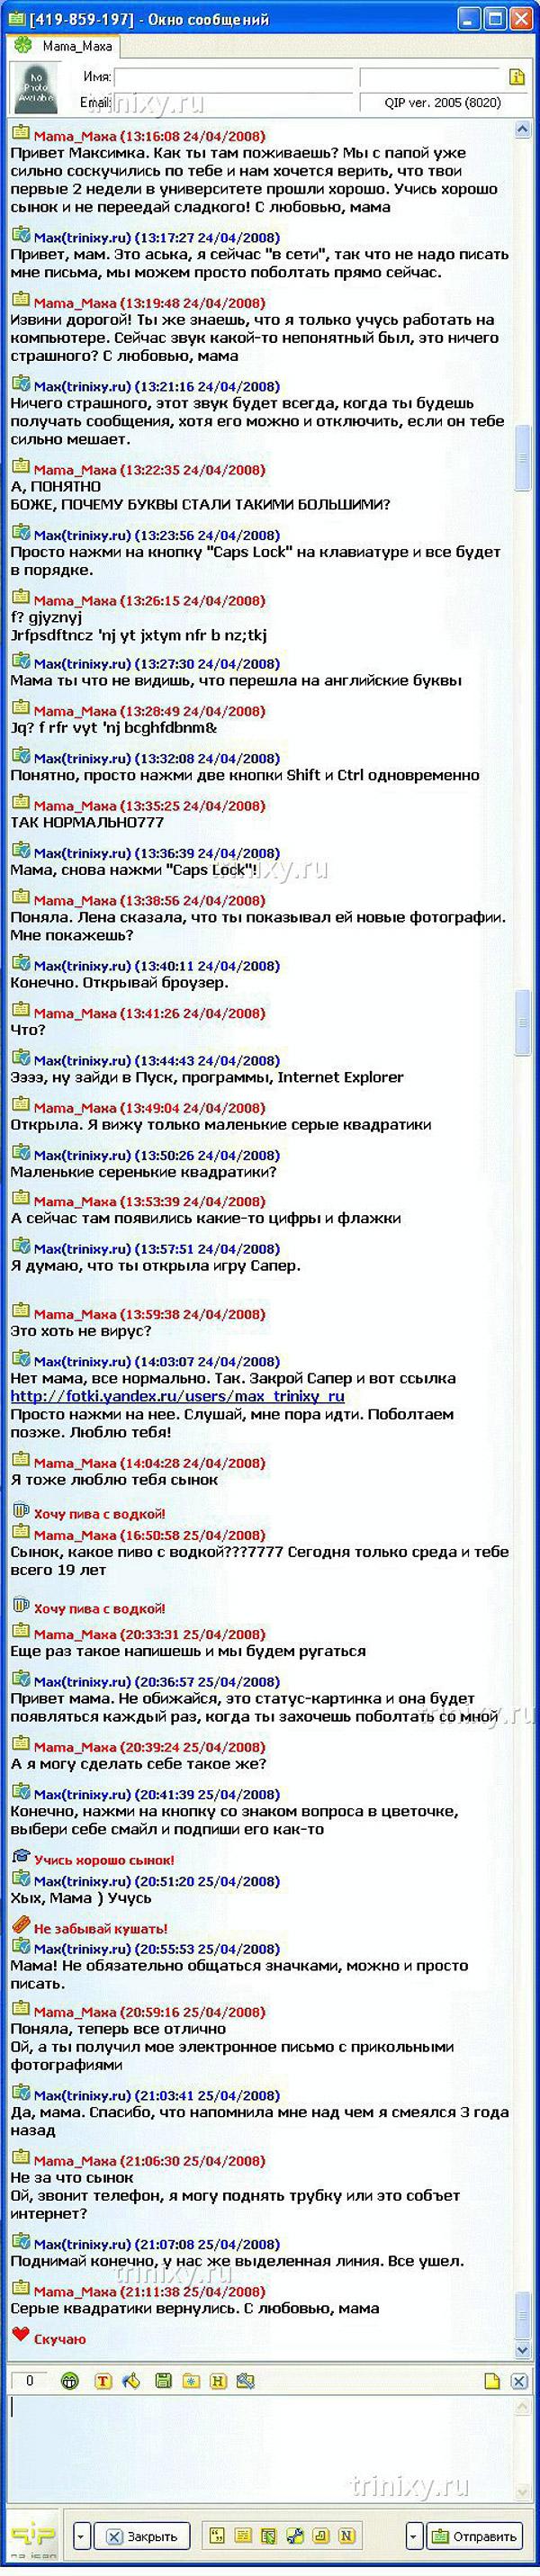 vkontakte.ru ��� �������� ���������� ����